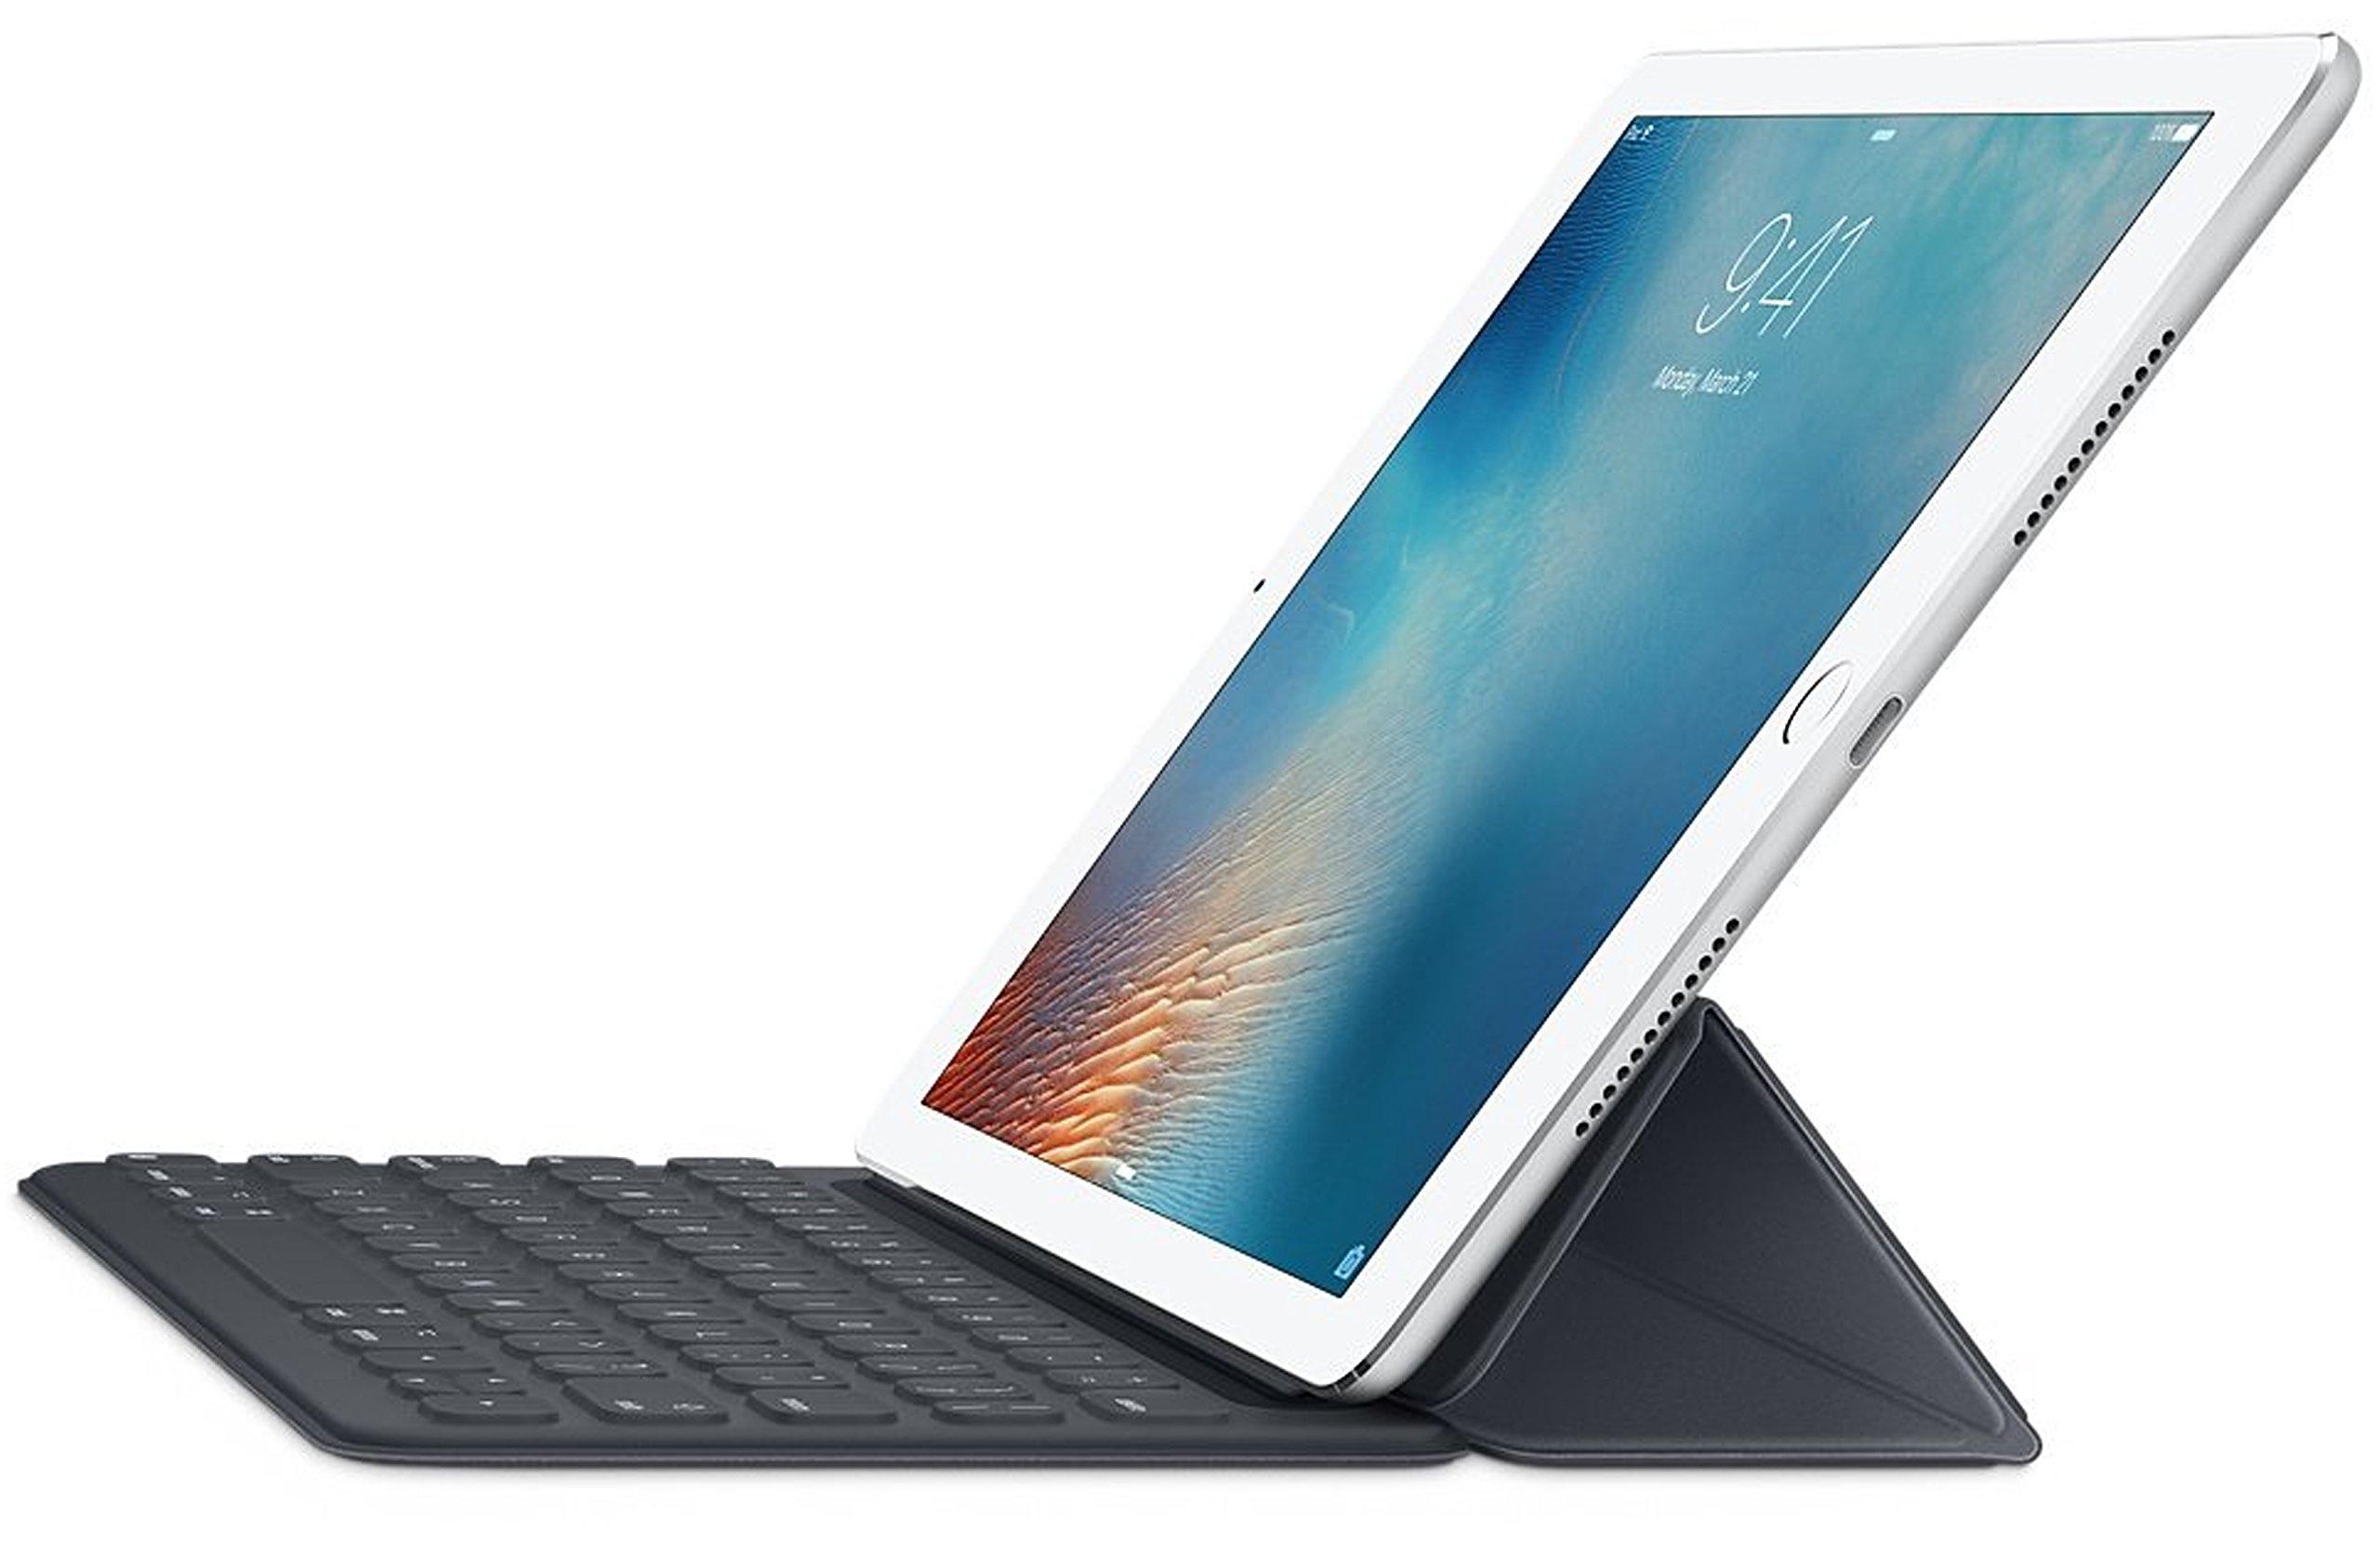 Apple Smart Keyboard for Apple iPad Pro 9.7-inch - MM2L2AM/A - Black (Renewed)